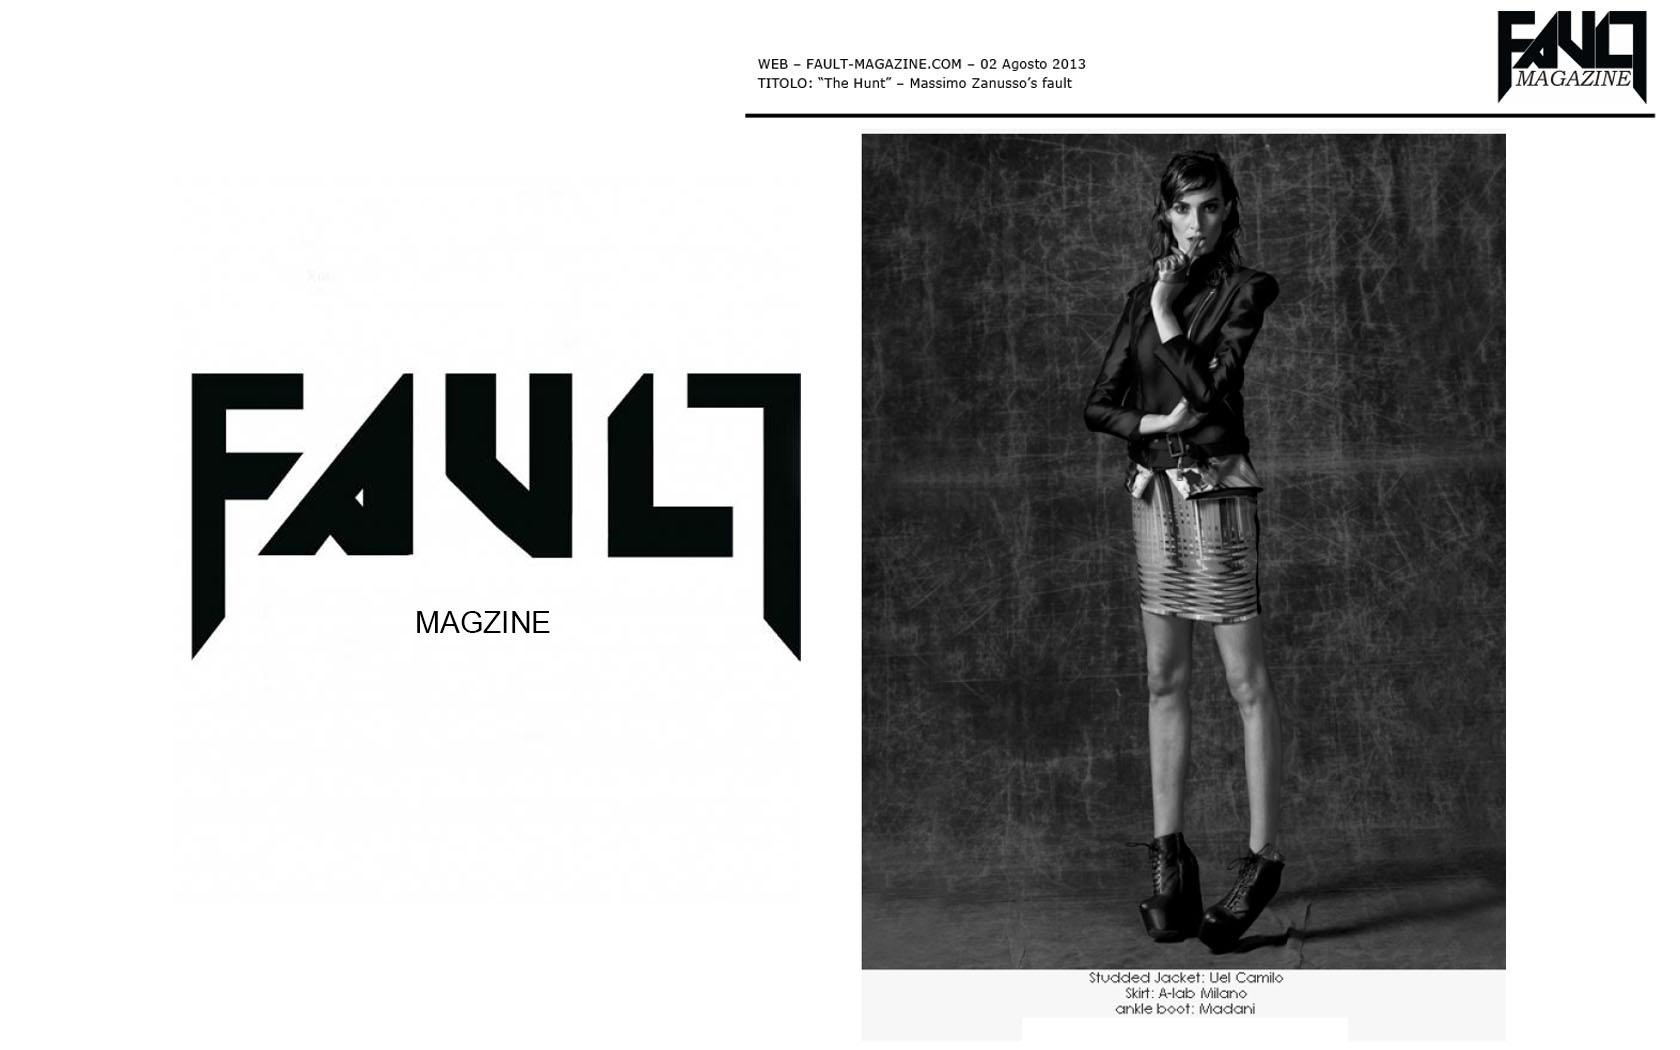 Uel camilo @Fault Magzine